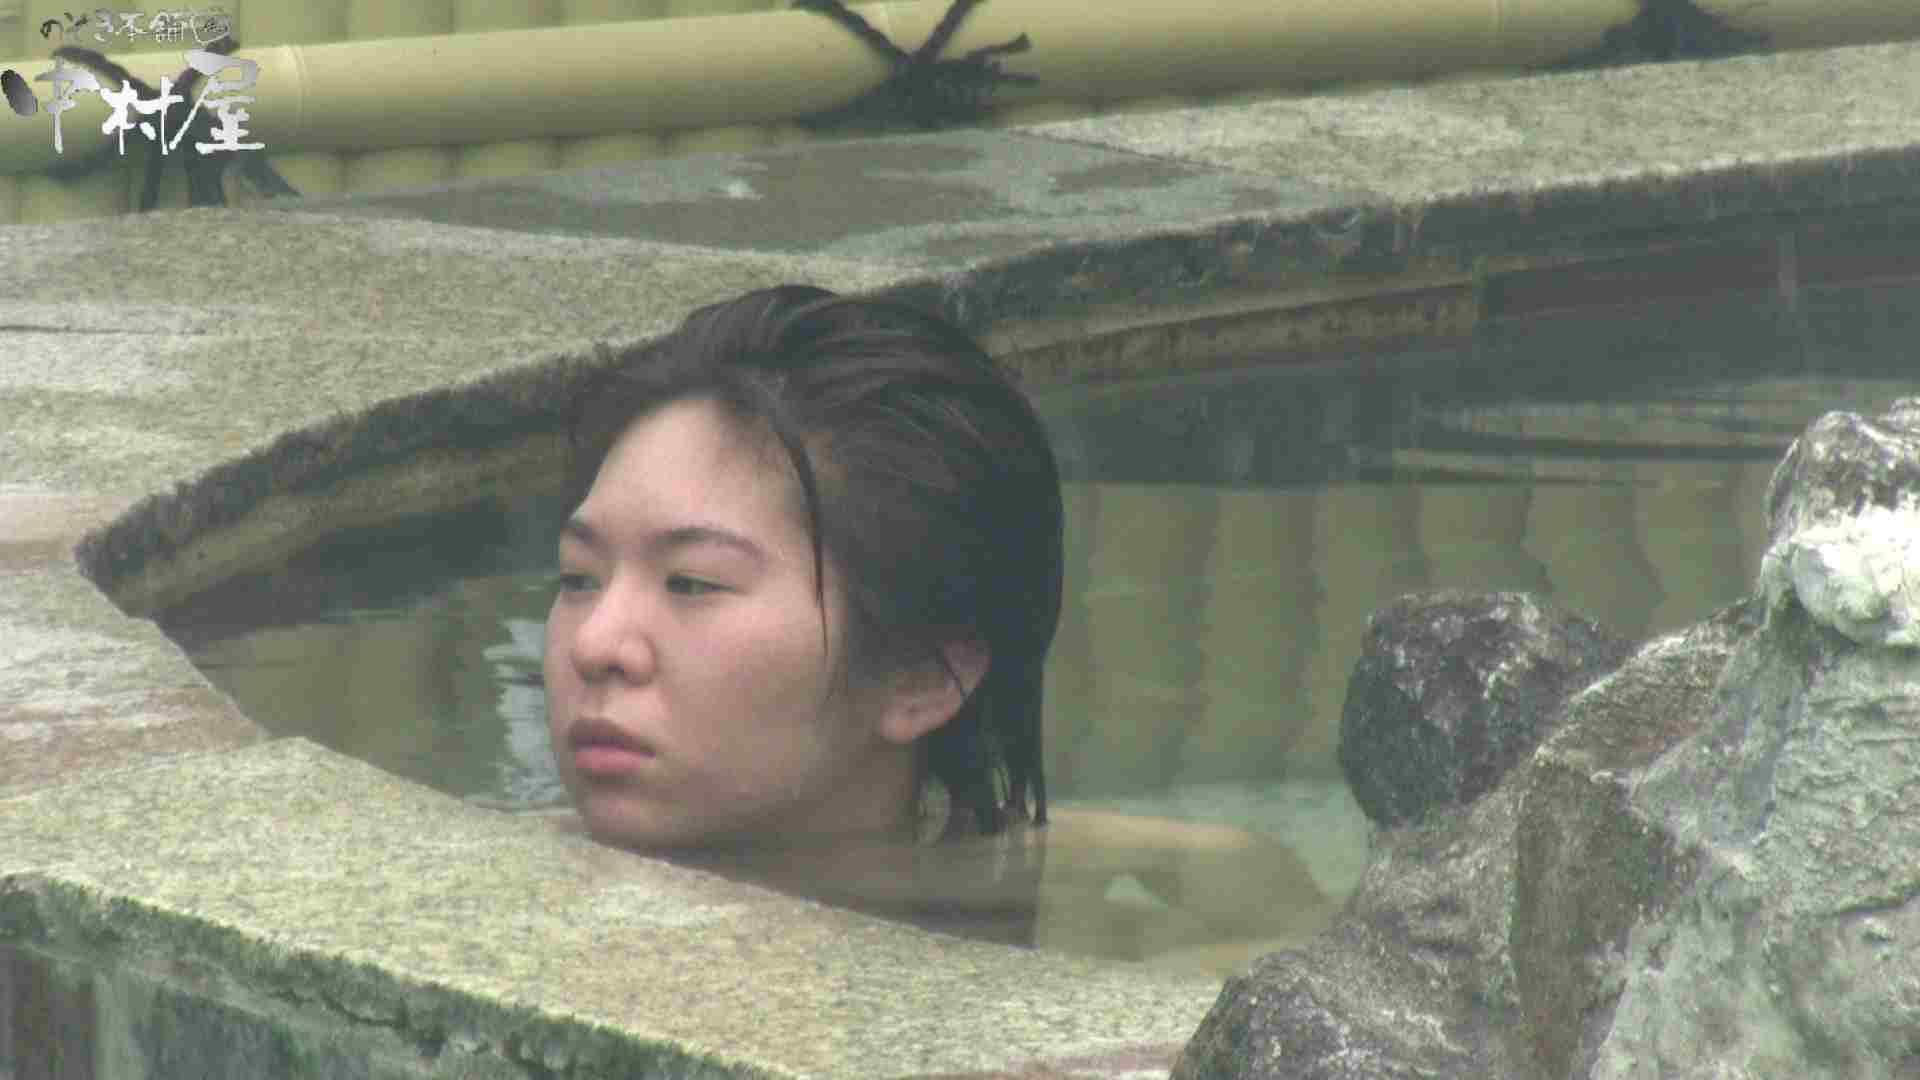 Aquaな露天風呂Vol.907 盗撮特撮  12pic 9